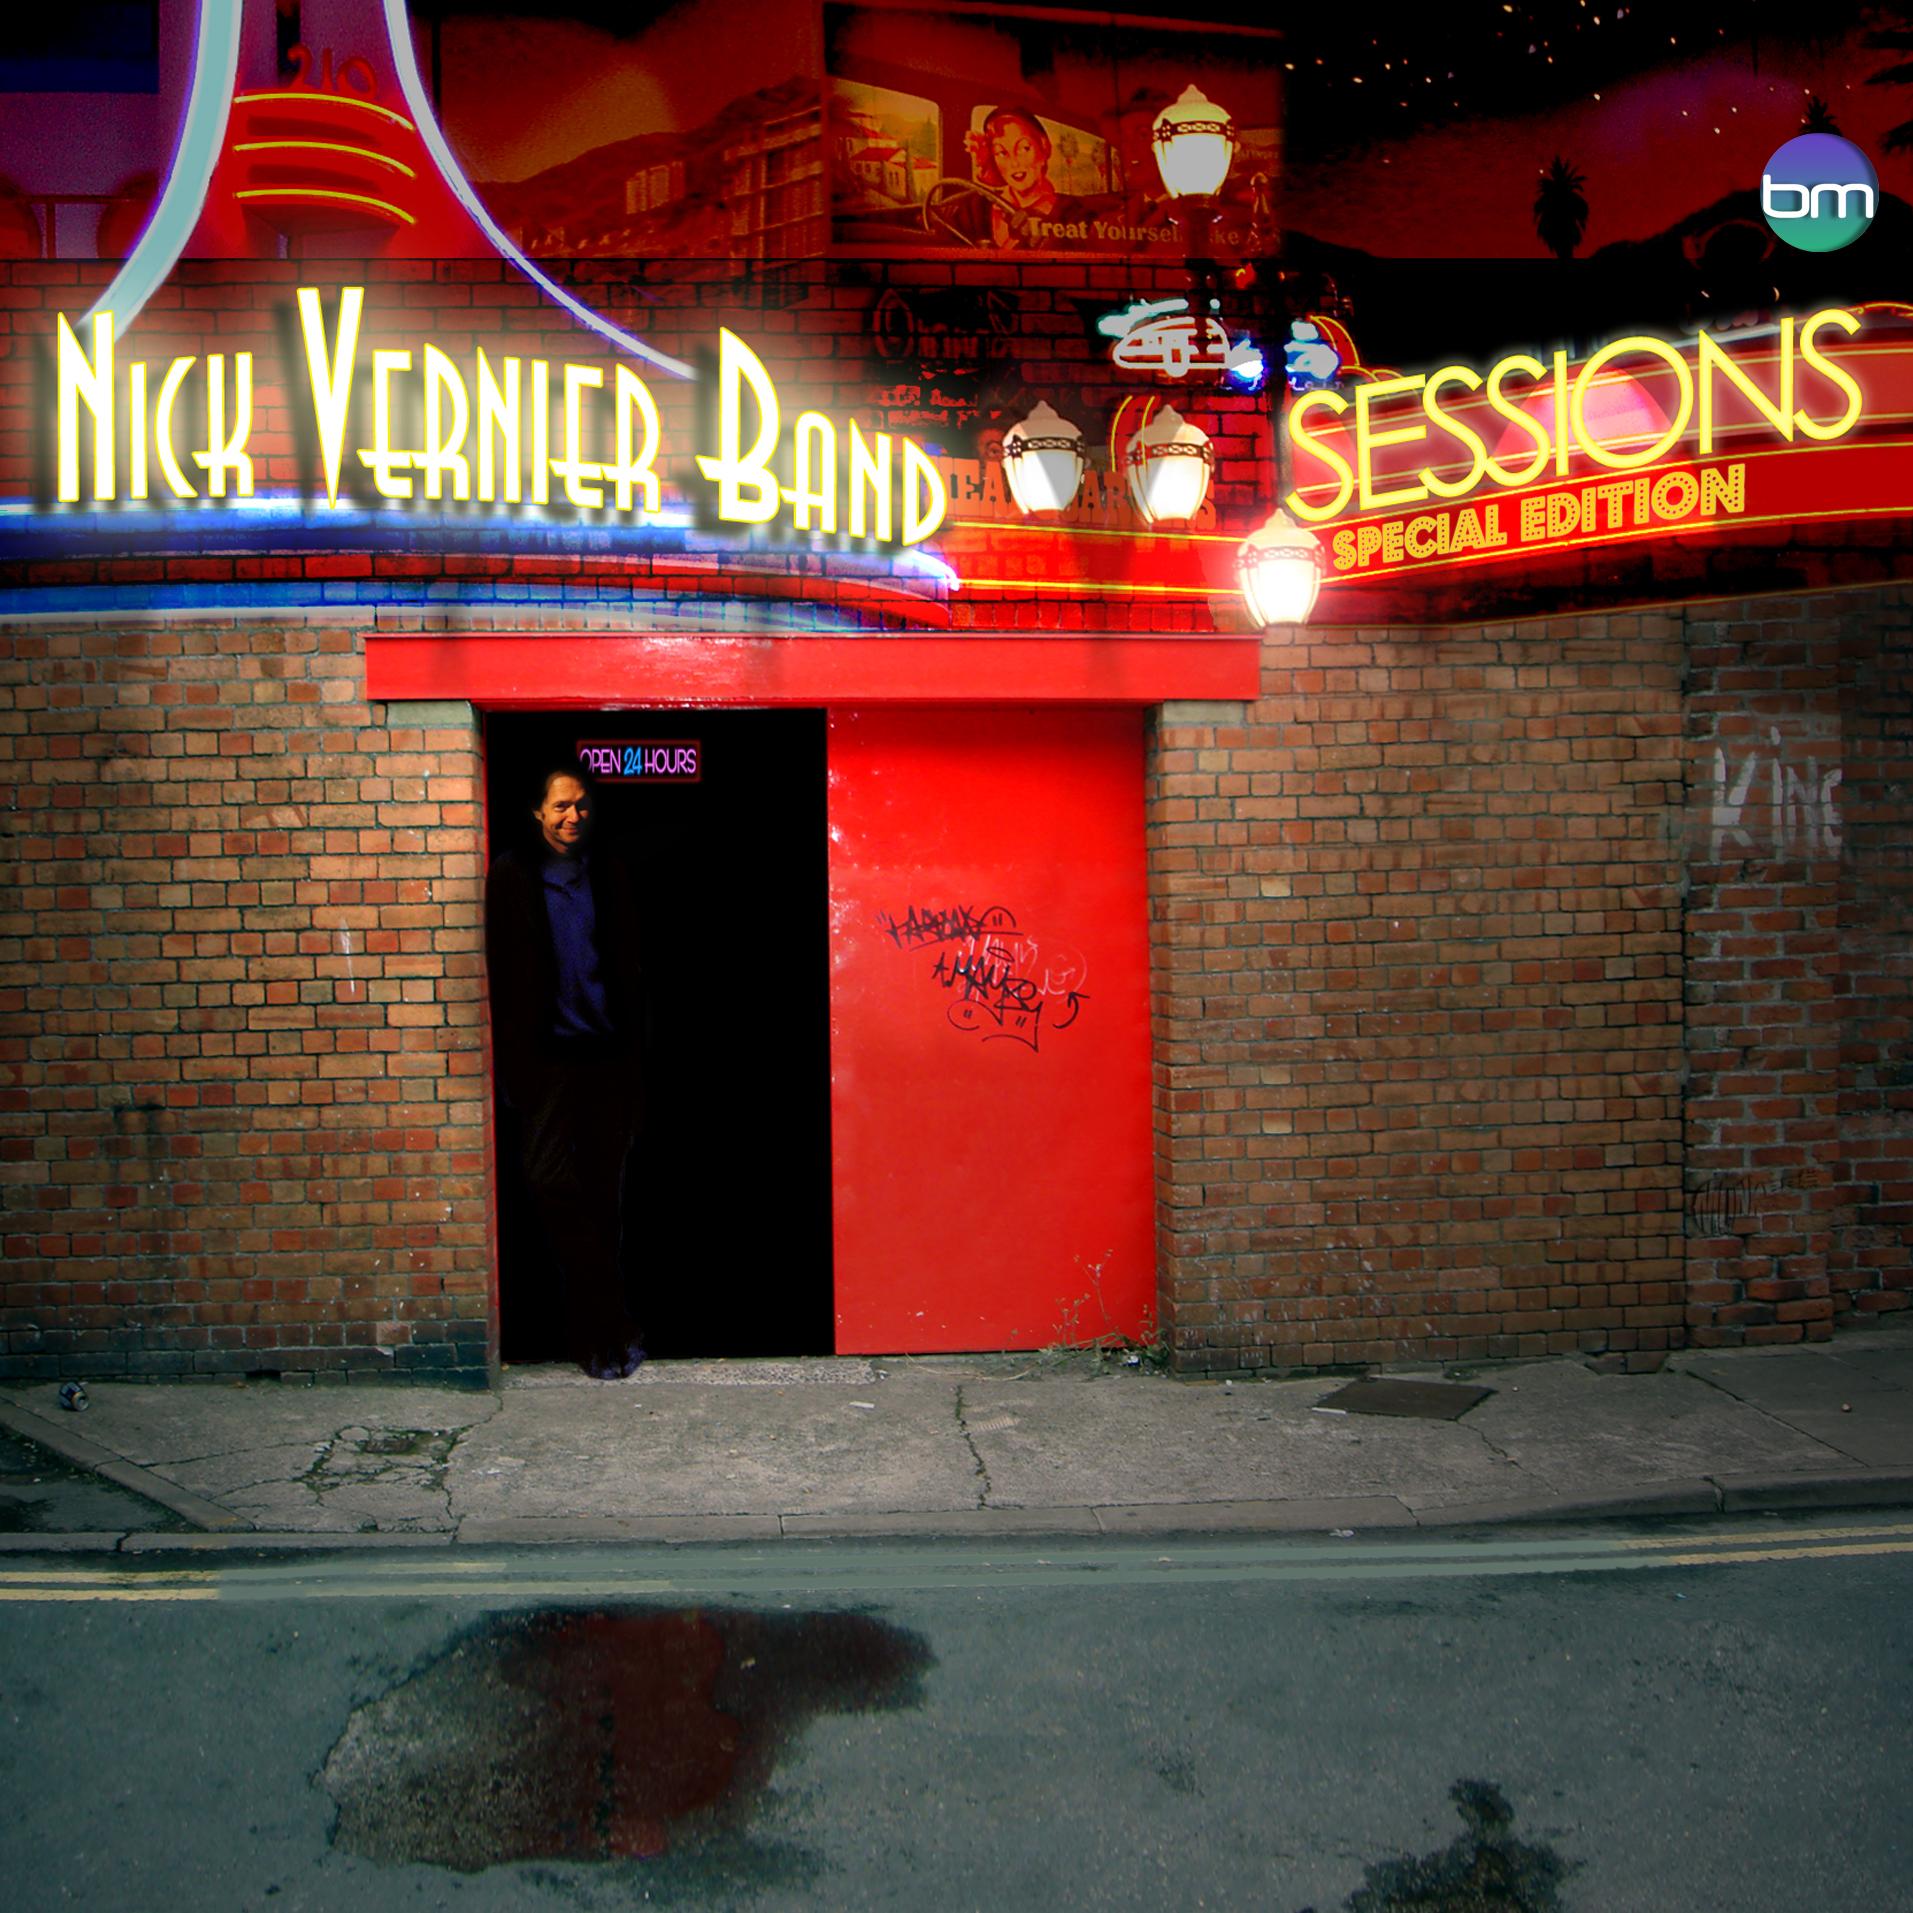 Nick Vernier Band